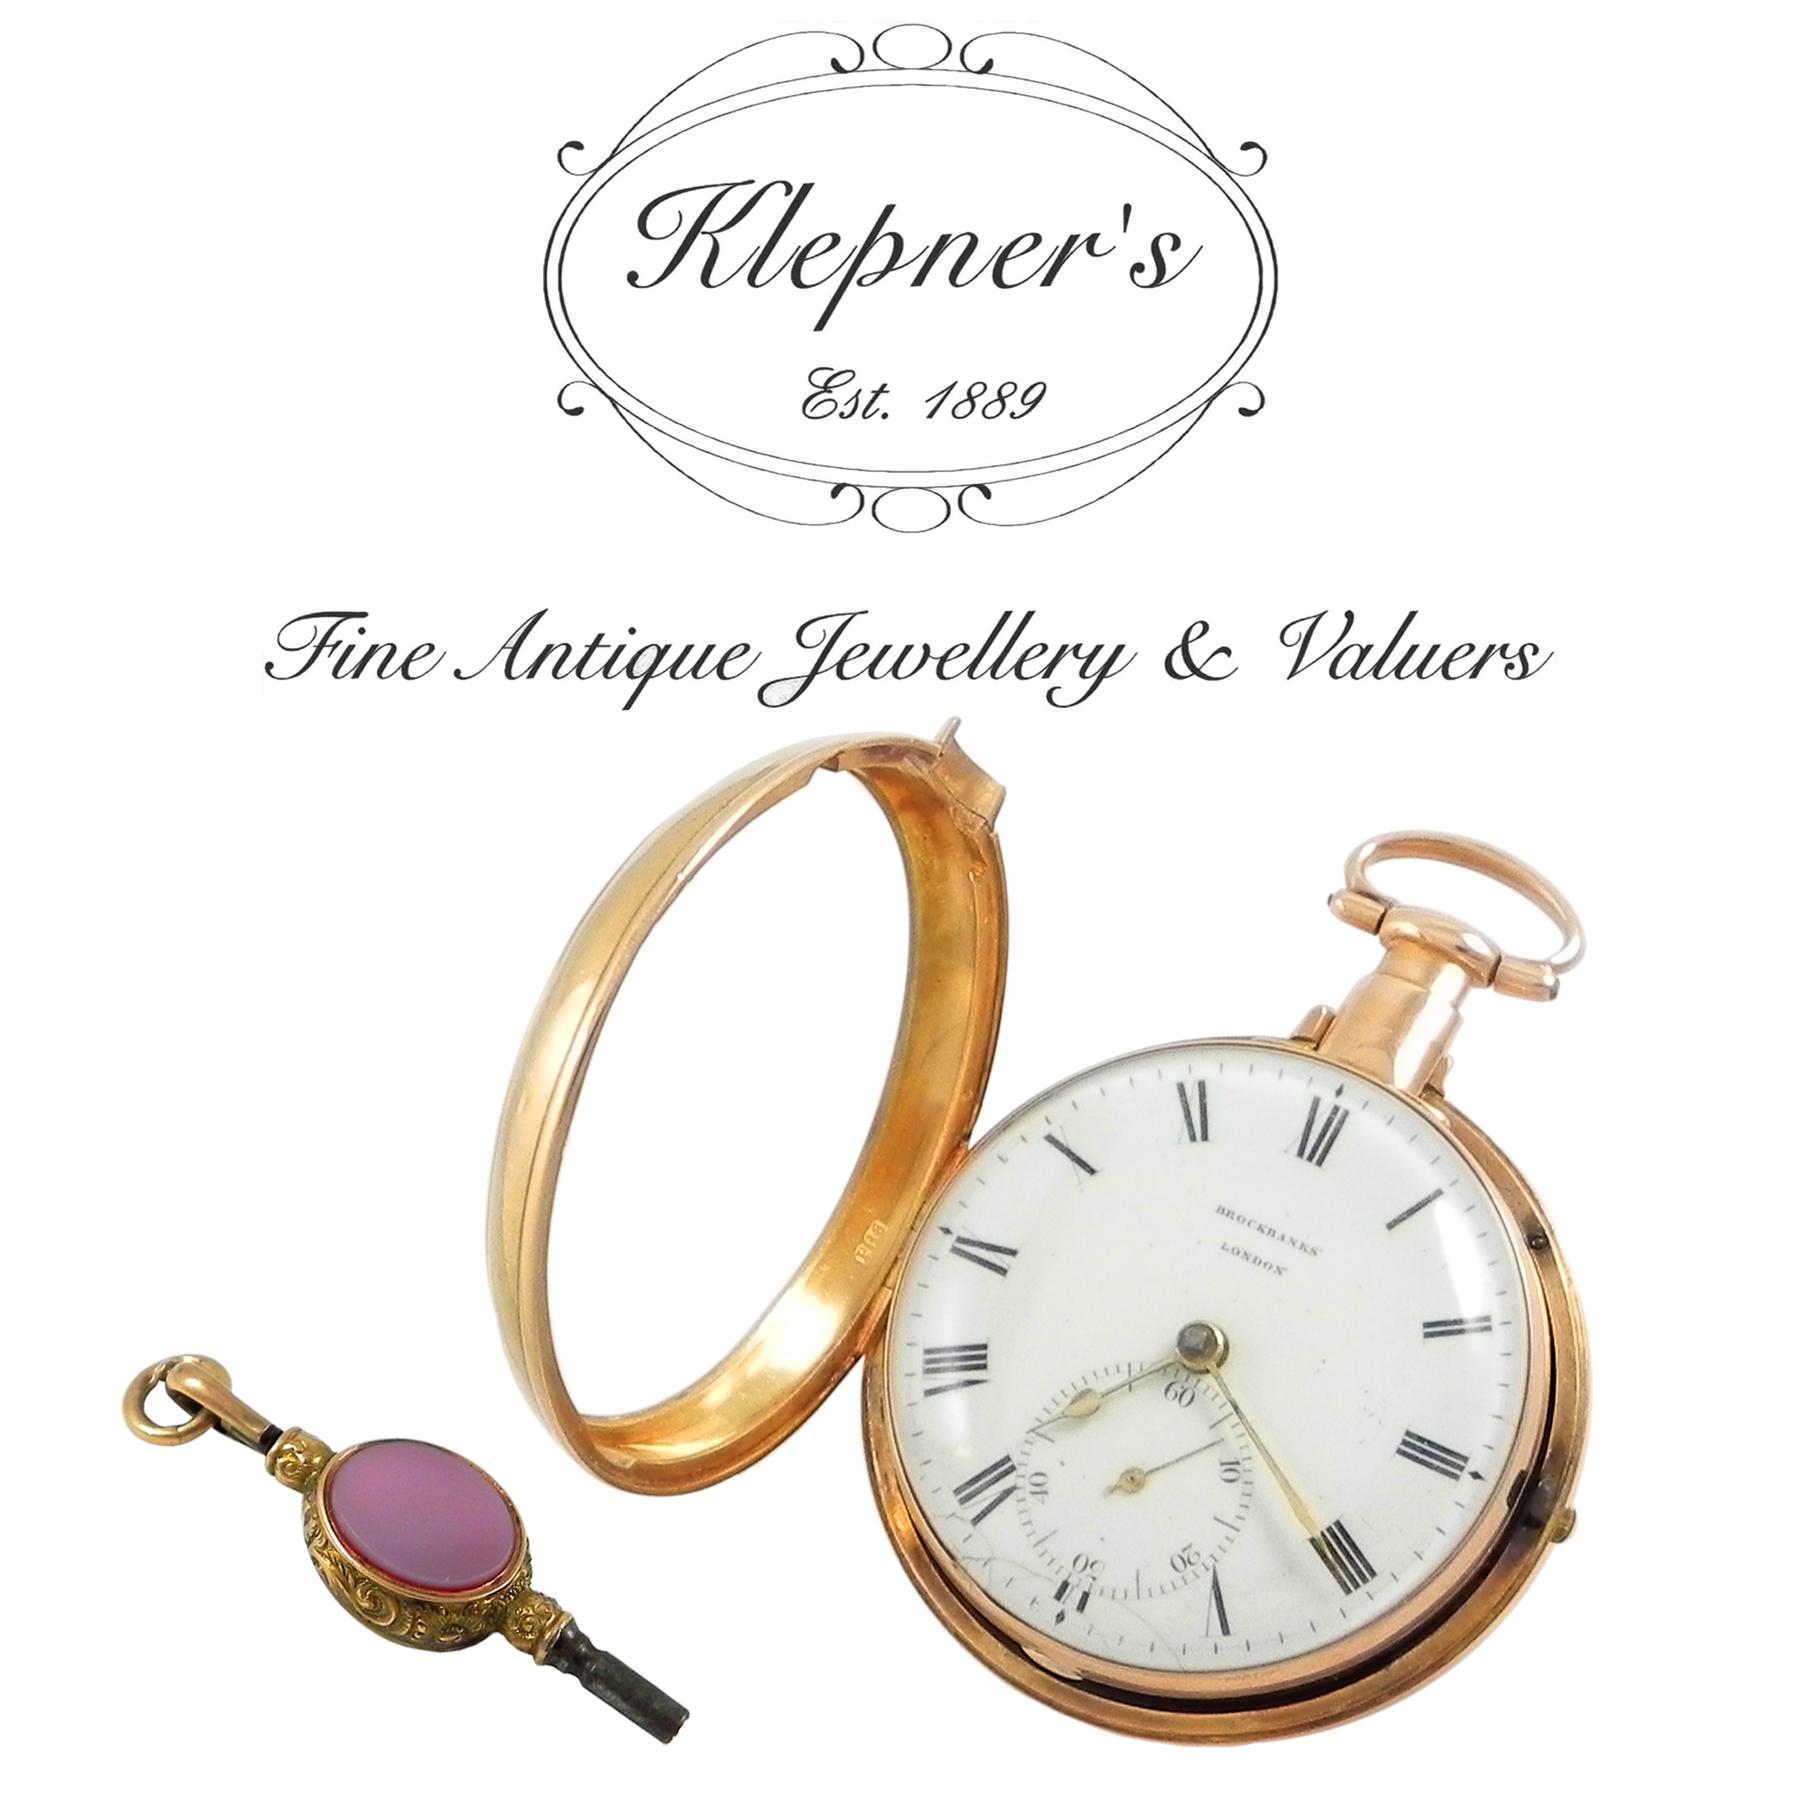 Antique Gold Pocket Watch Key Wind.jpg